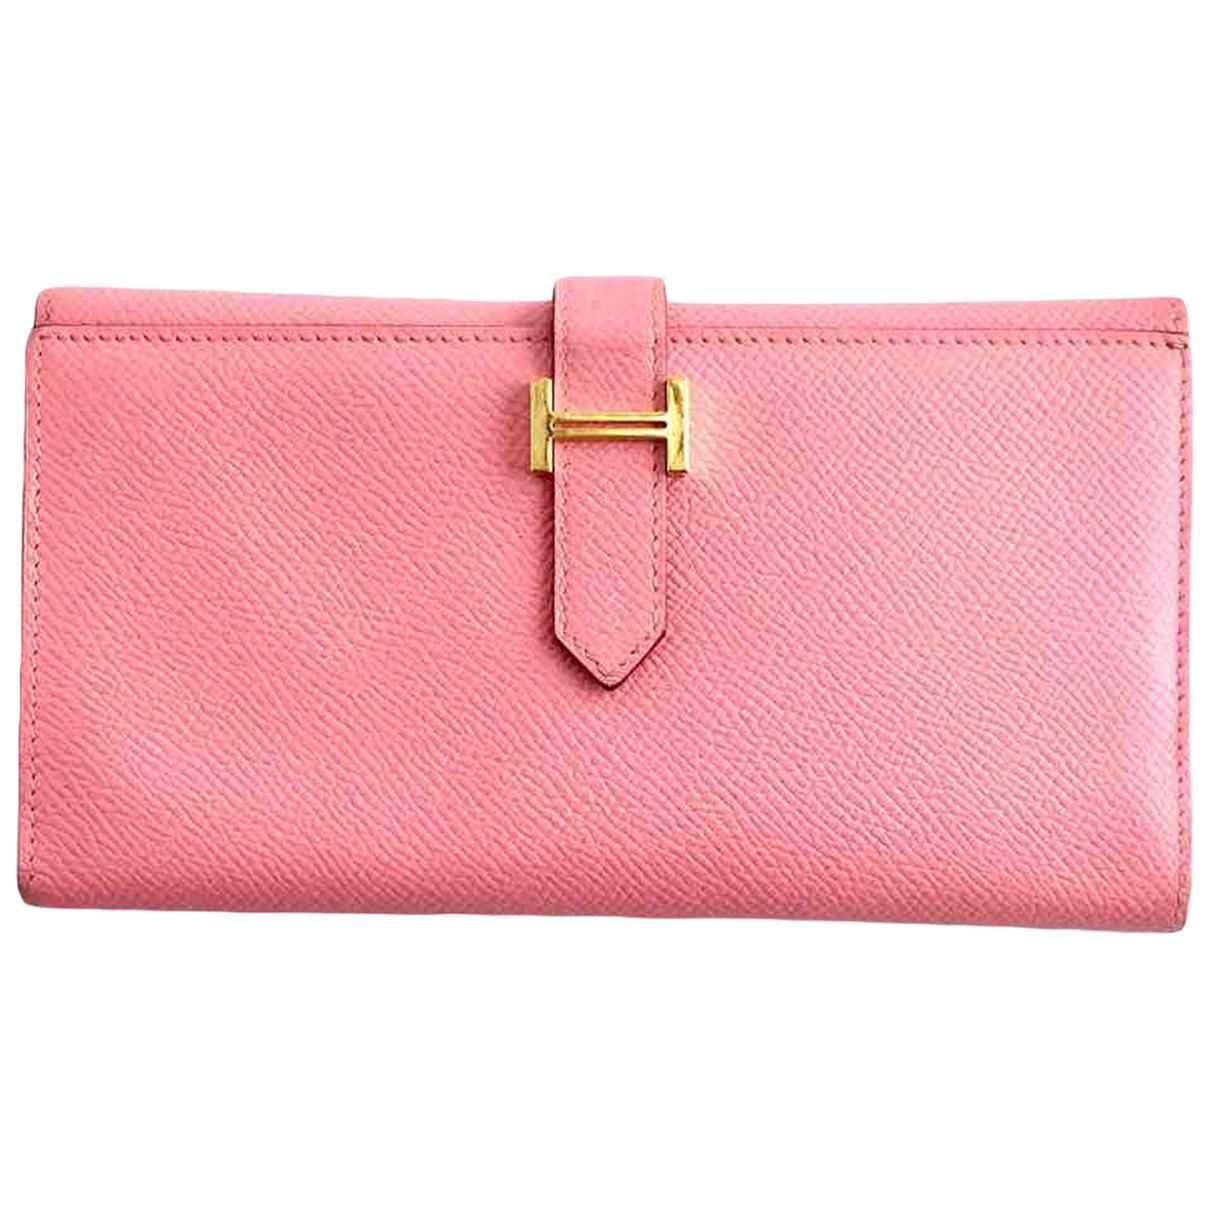 Hermes - Portefeuille Bearn pour femme en cuir - rose